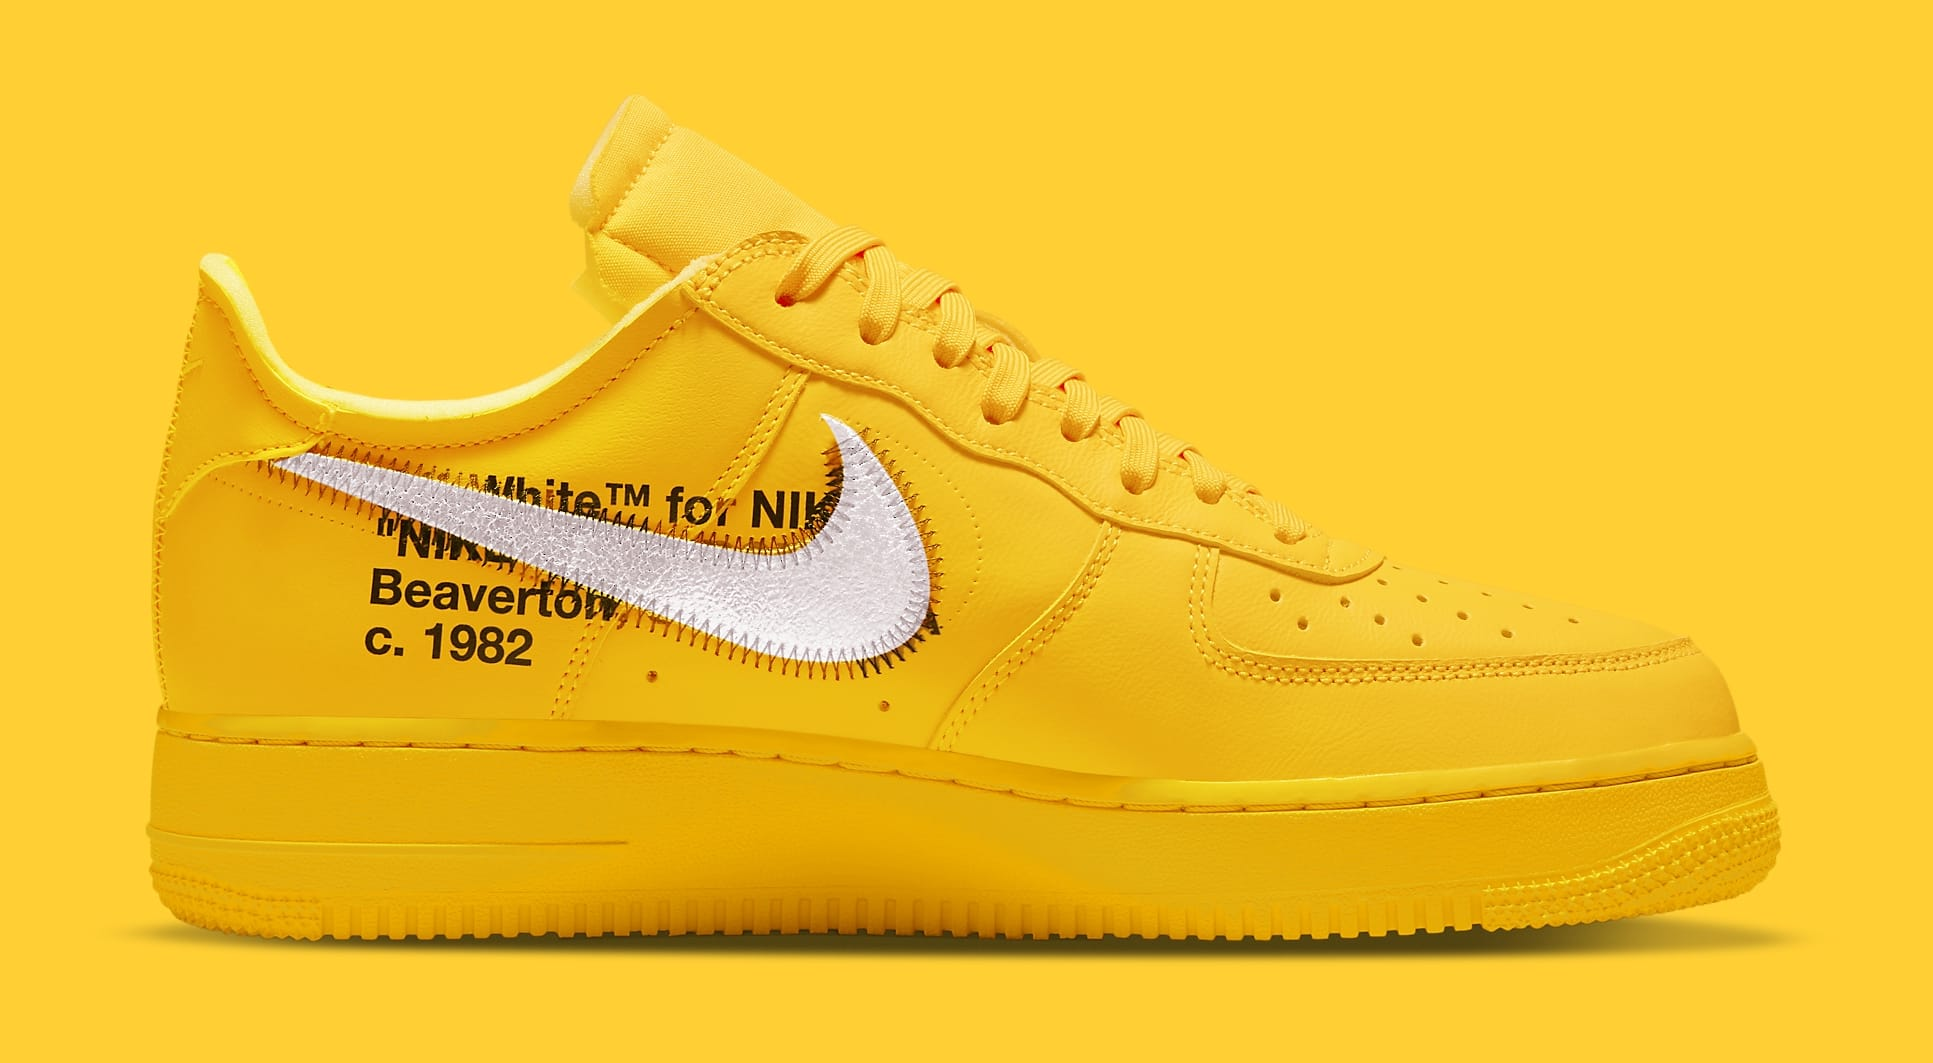 Off-White x Nike Air Force 1 Low 'Lemonade' DD1876-700 Medial